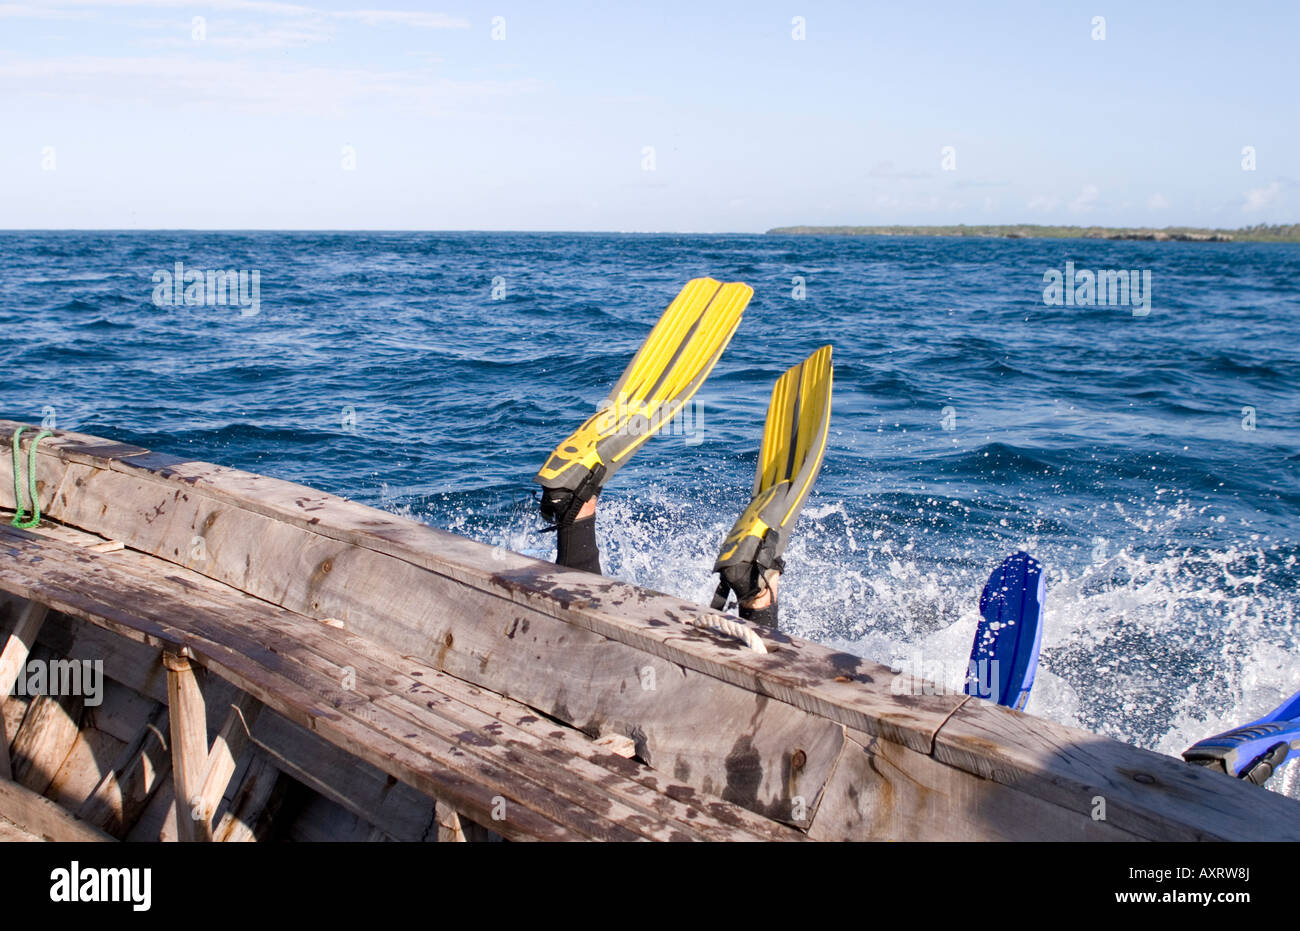 Scuba divers entering the water from a boat in Chole Bay Mafia Island Tanzania - Stock Image